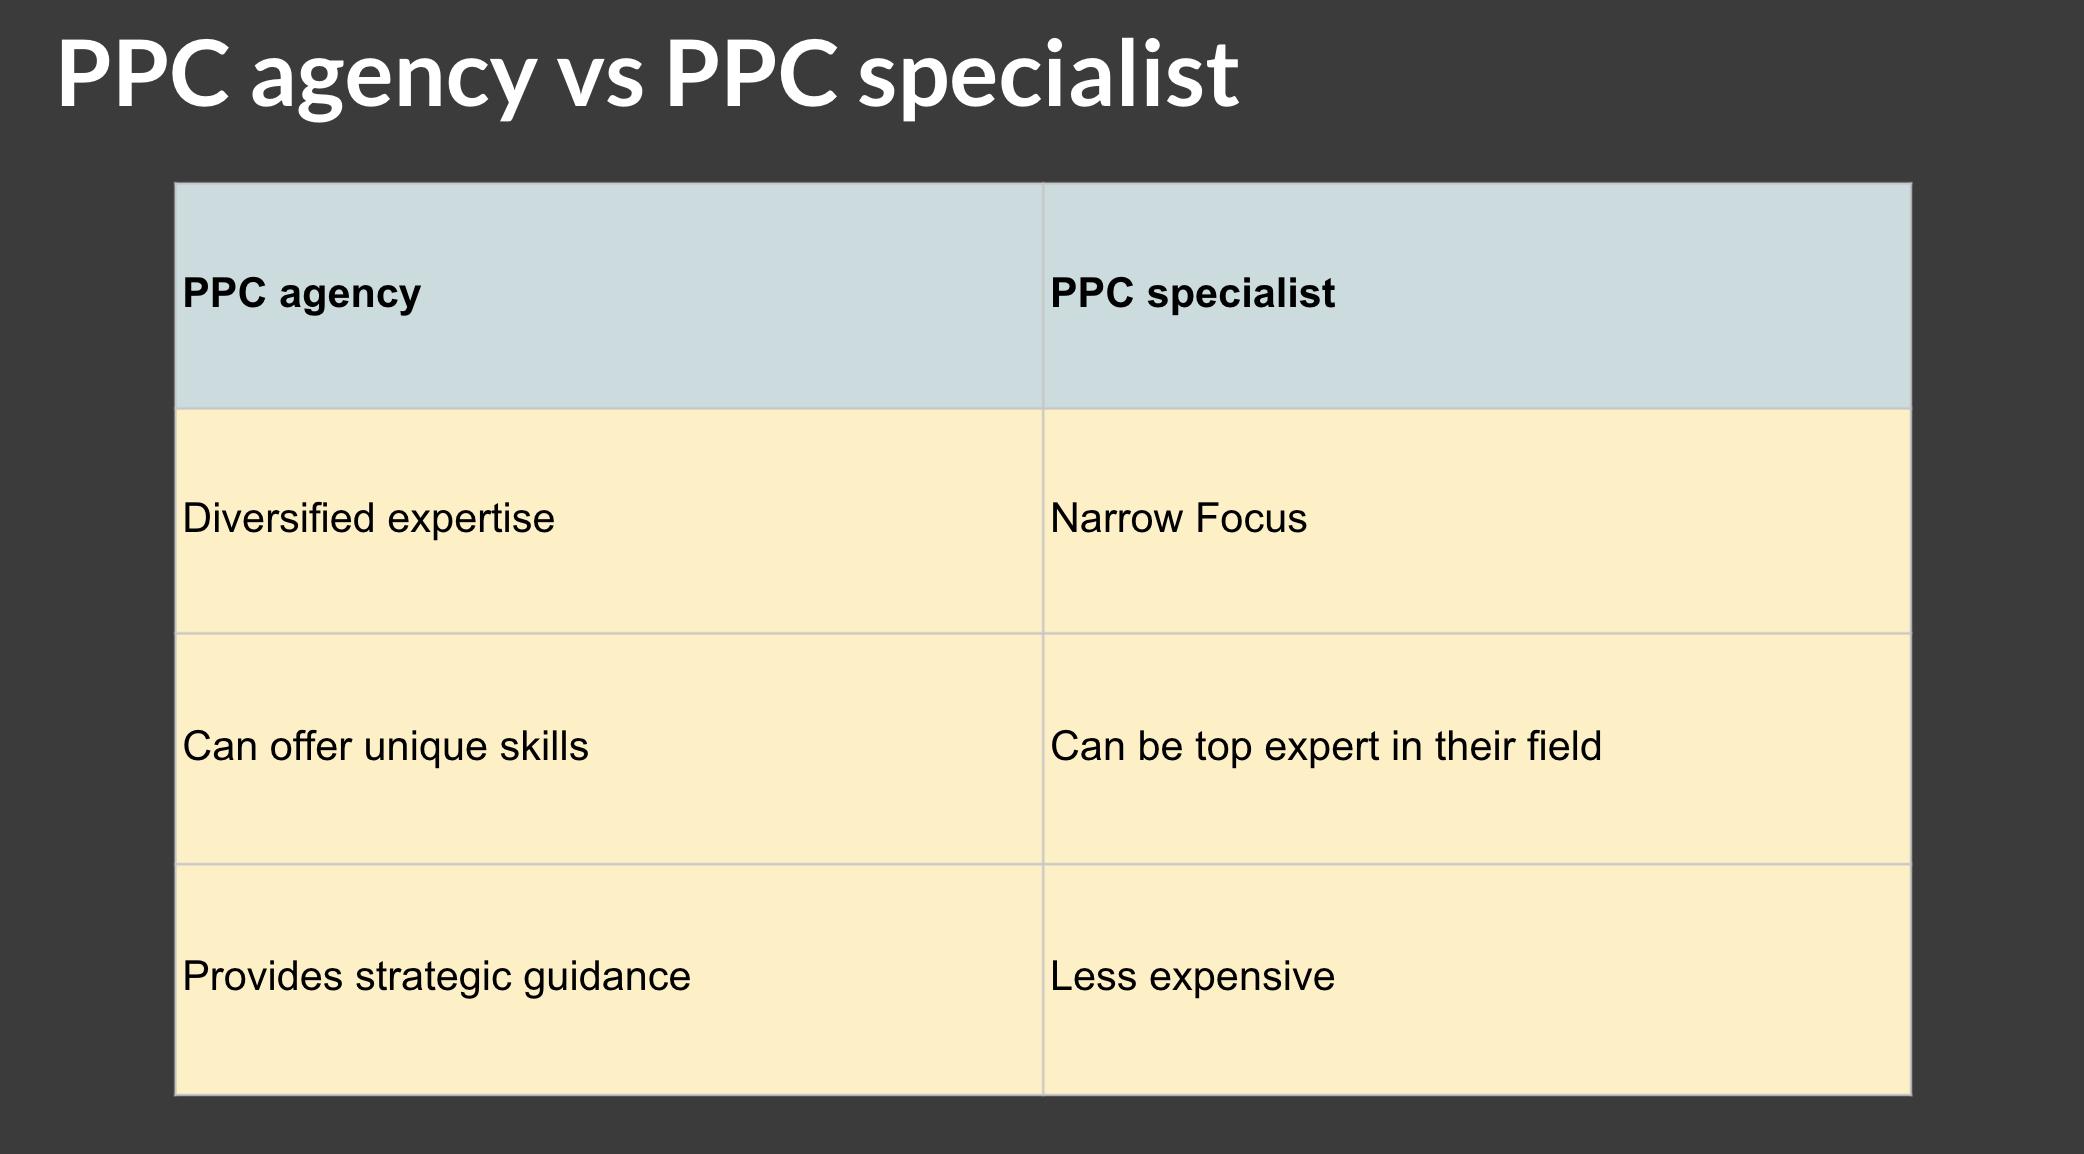 PPC agency vs PPC specialist